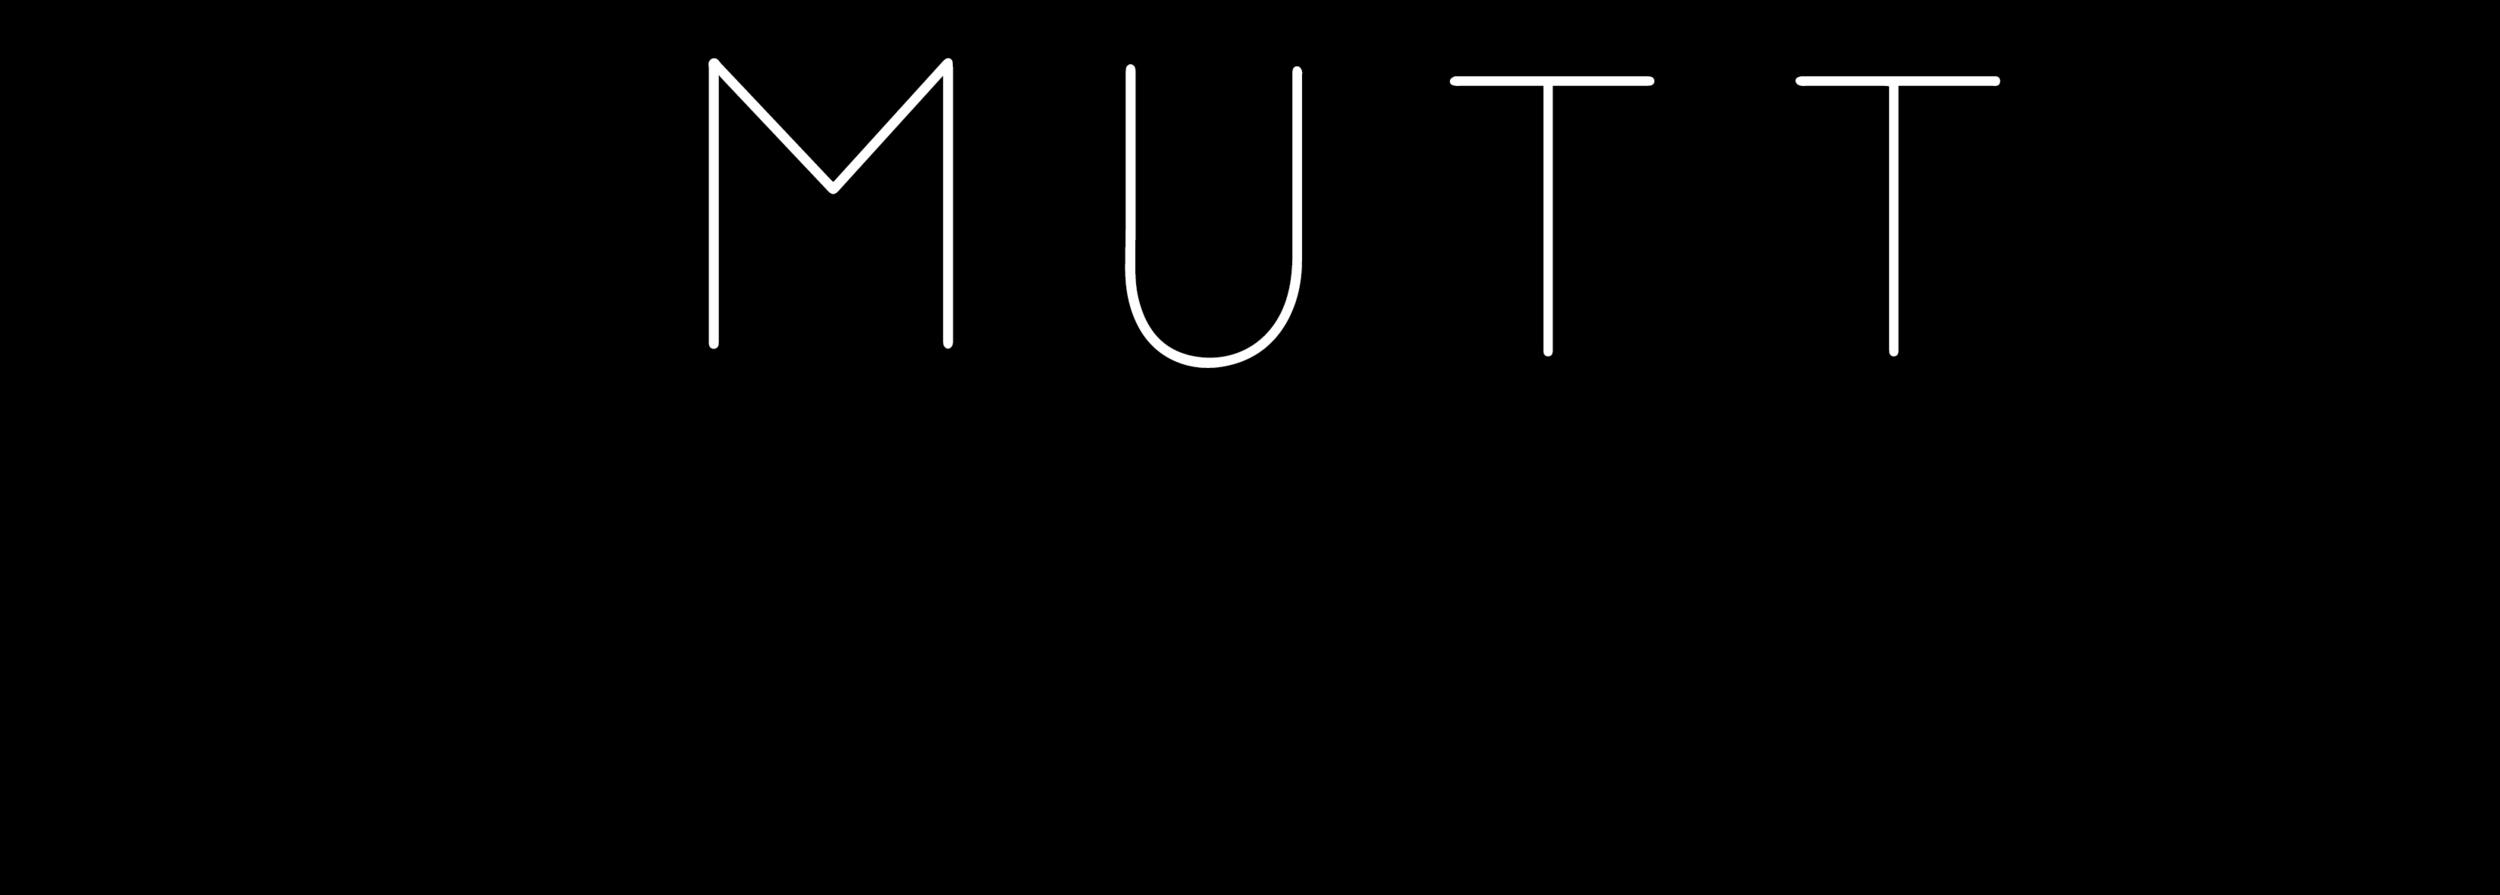 Mutt-std-logo.png